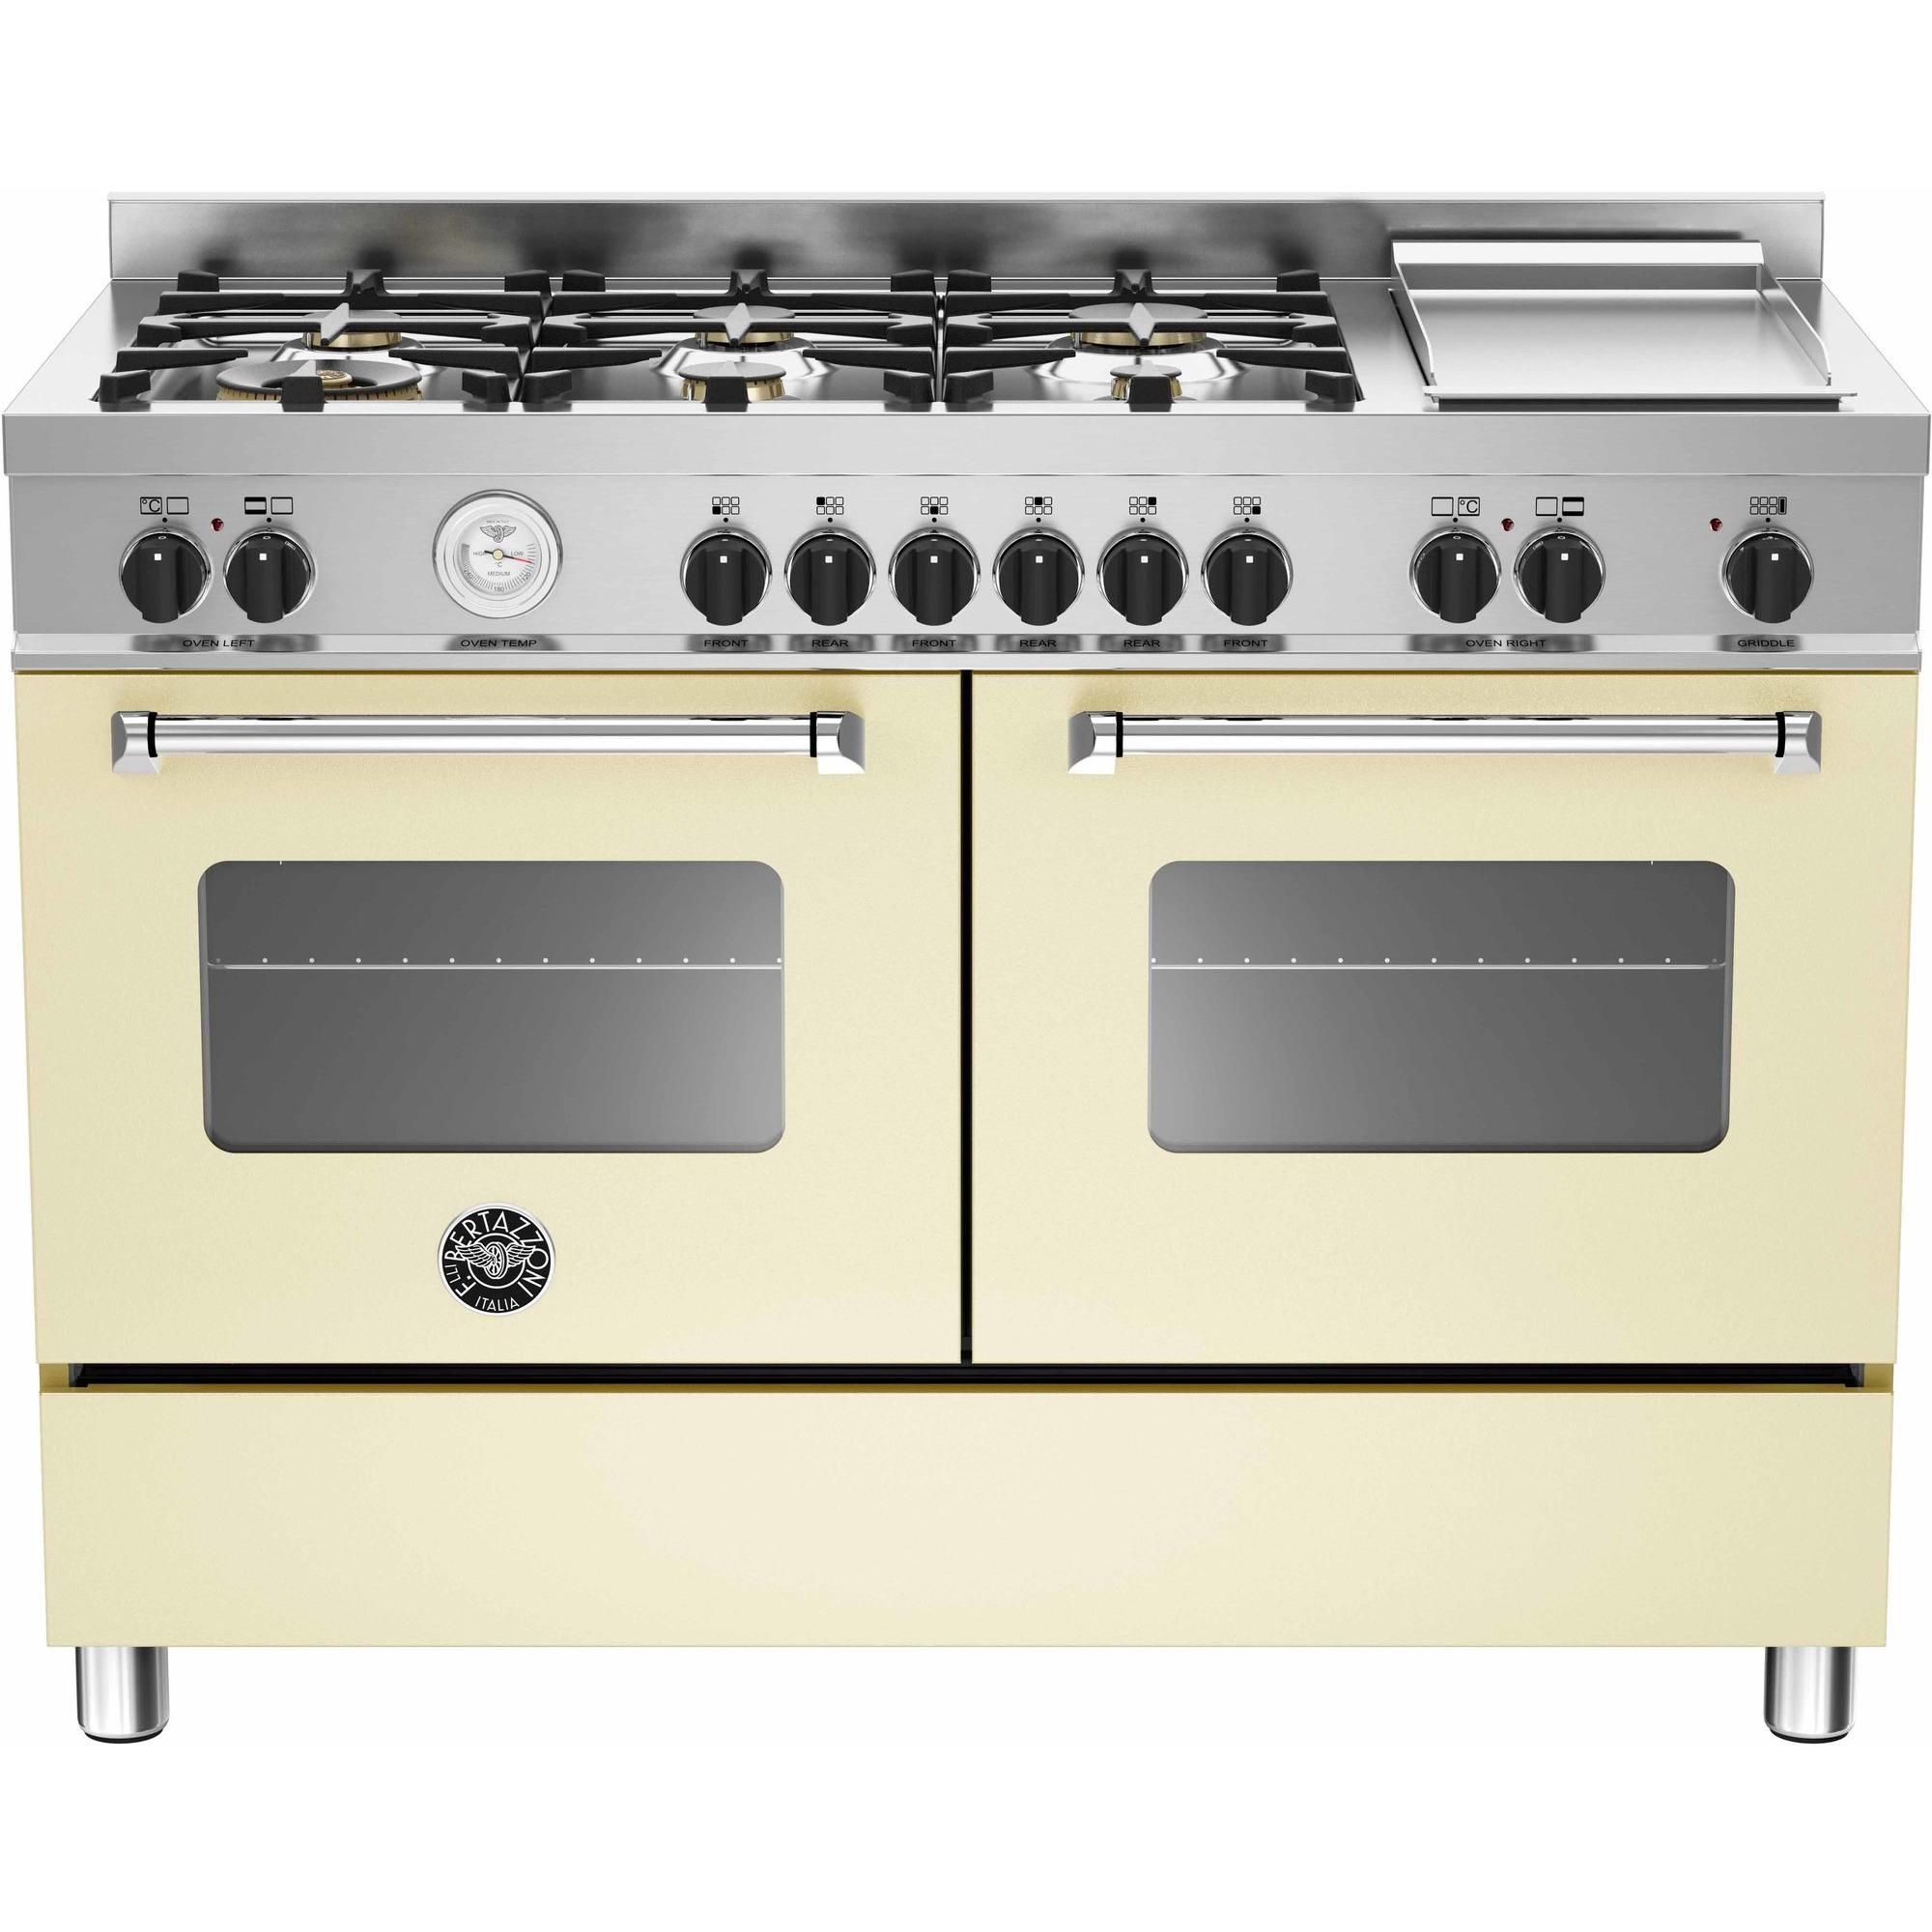 Bertazzoni MAS1206 Gasspis 120 cm 2 ugnar 6 brännare + elektrisk tepanyaki Beige